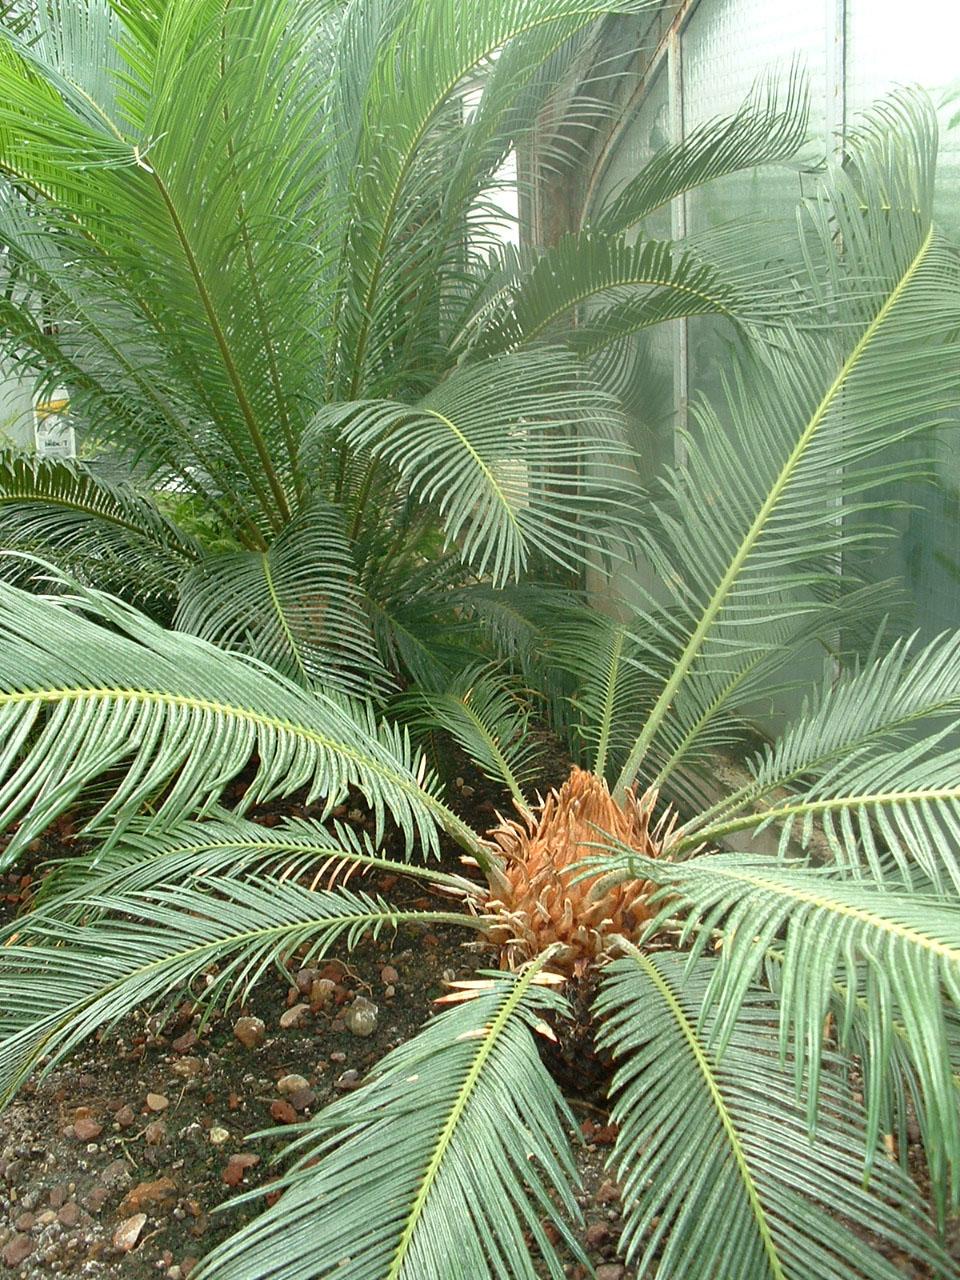 Cycadophyta - Wikispecies